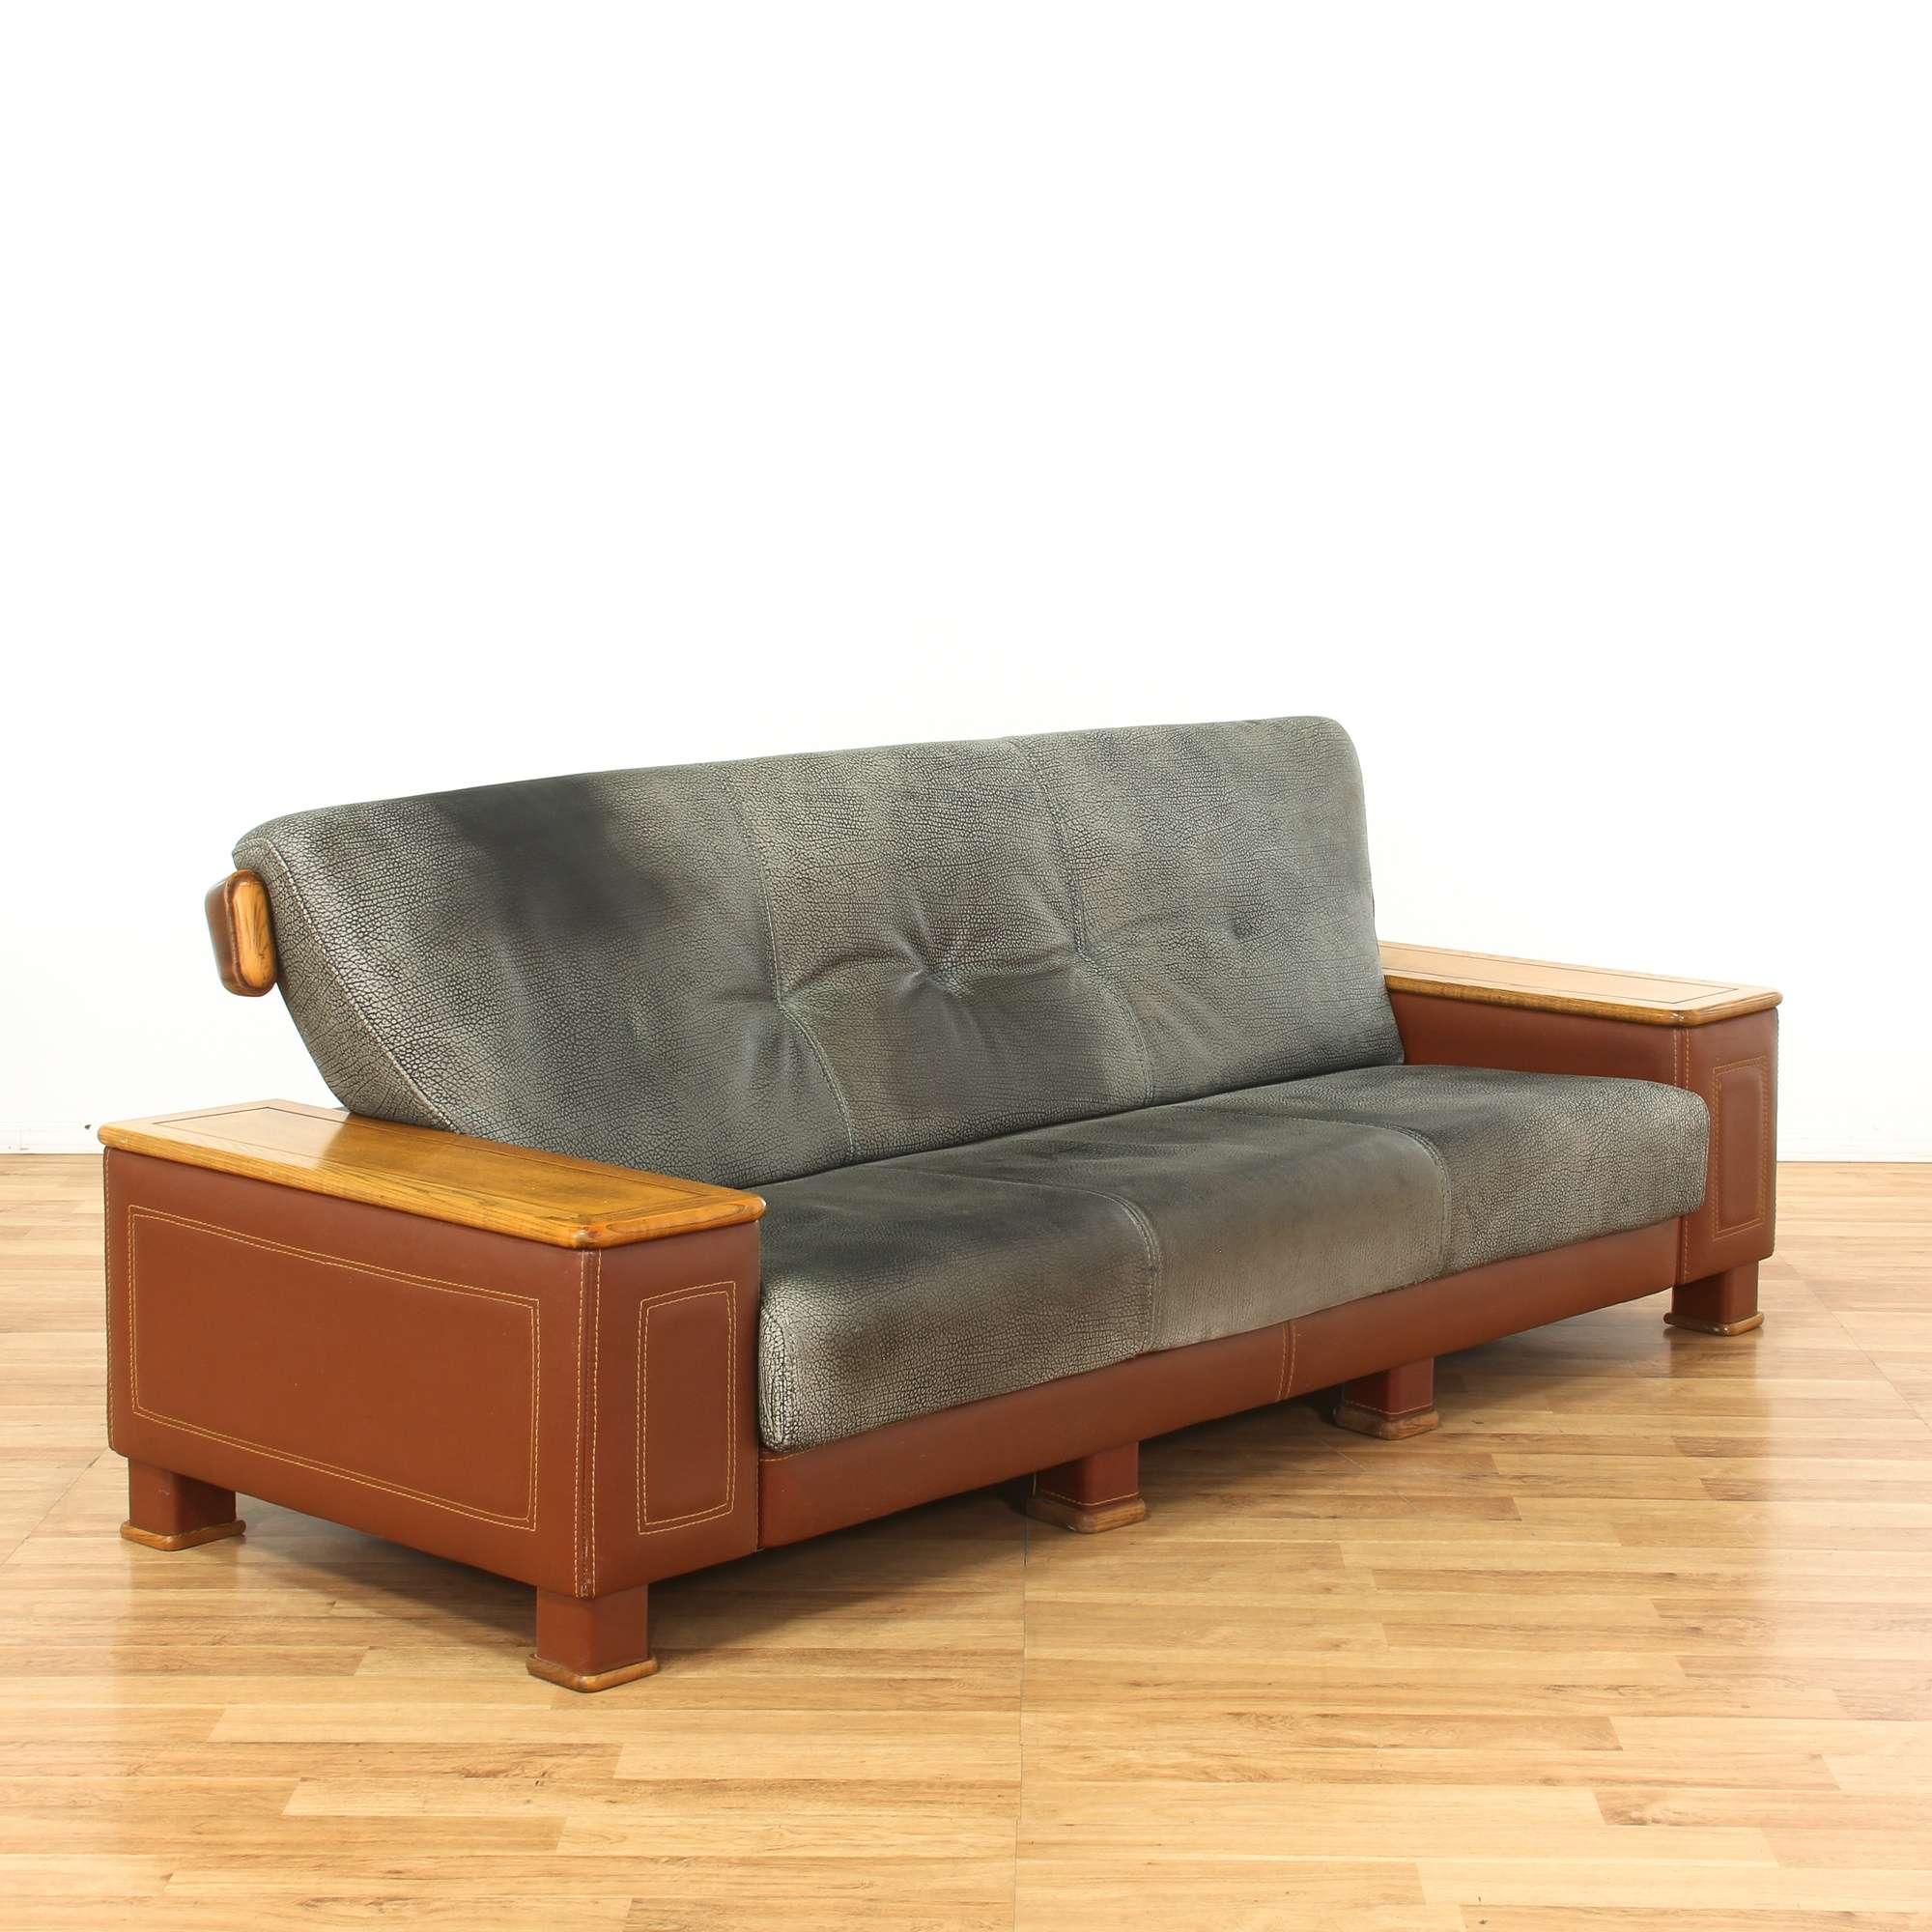 Grey & Brown Distressed Leather Sofa w/ Wood Frame ...